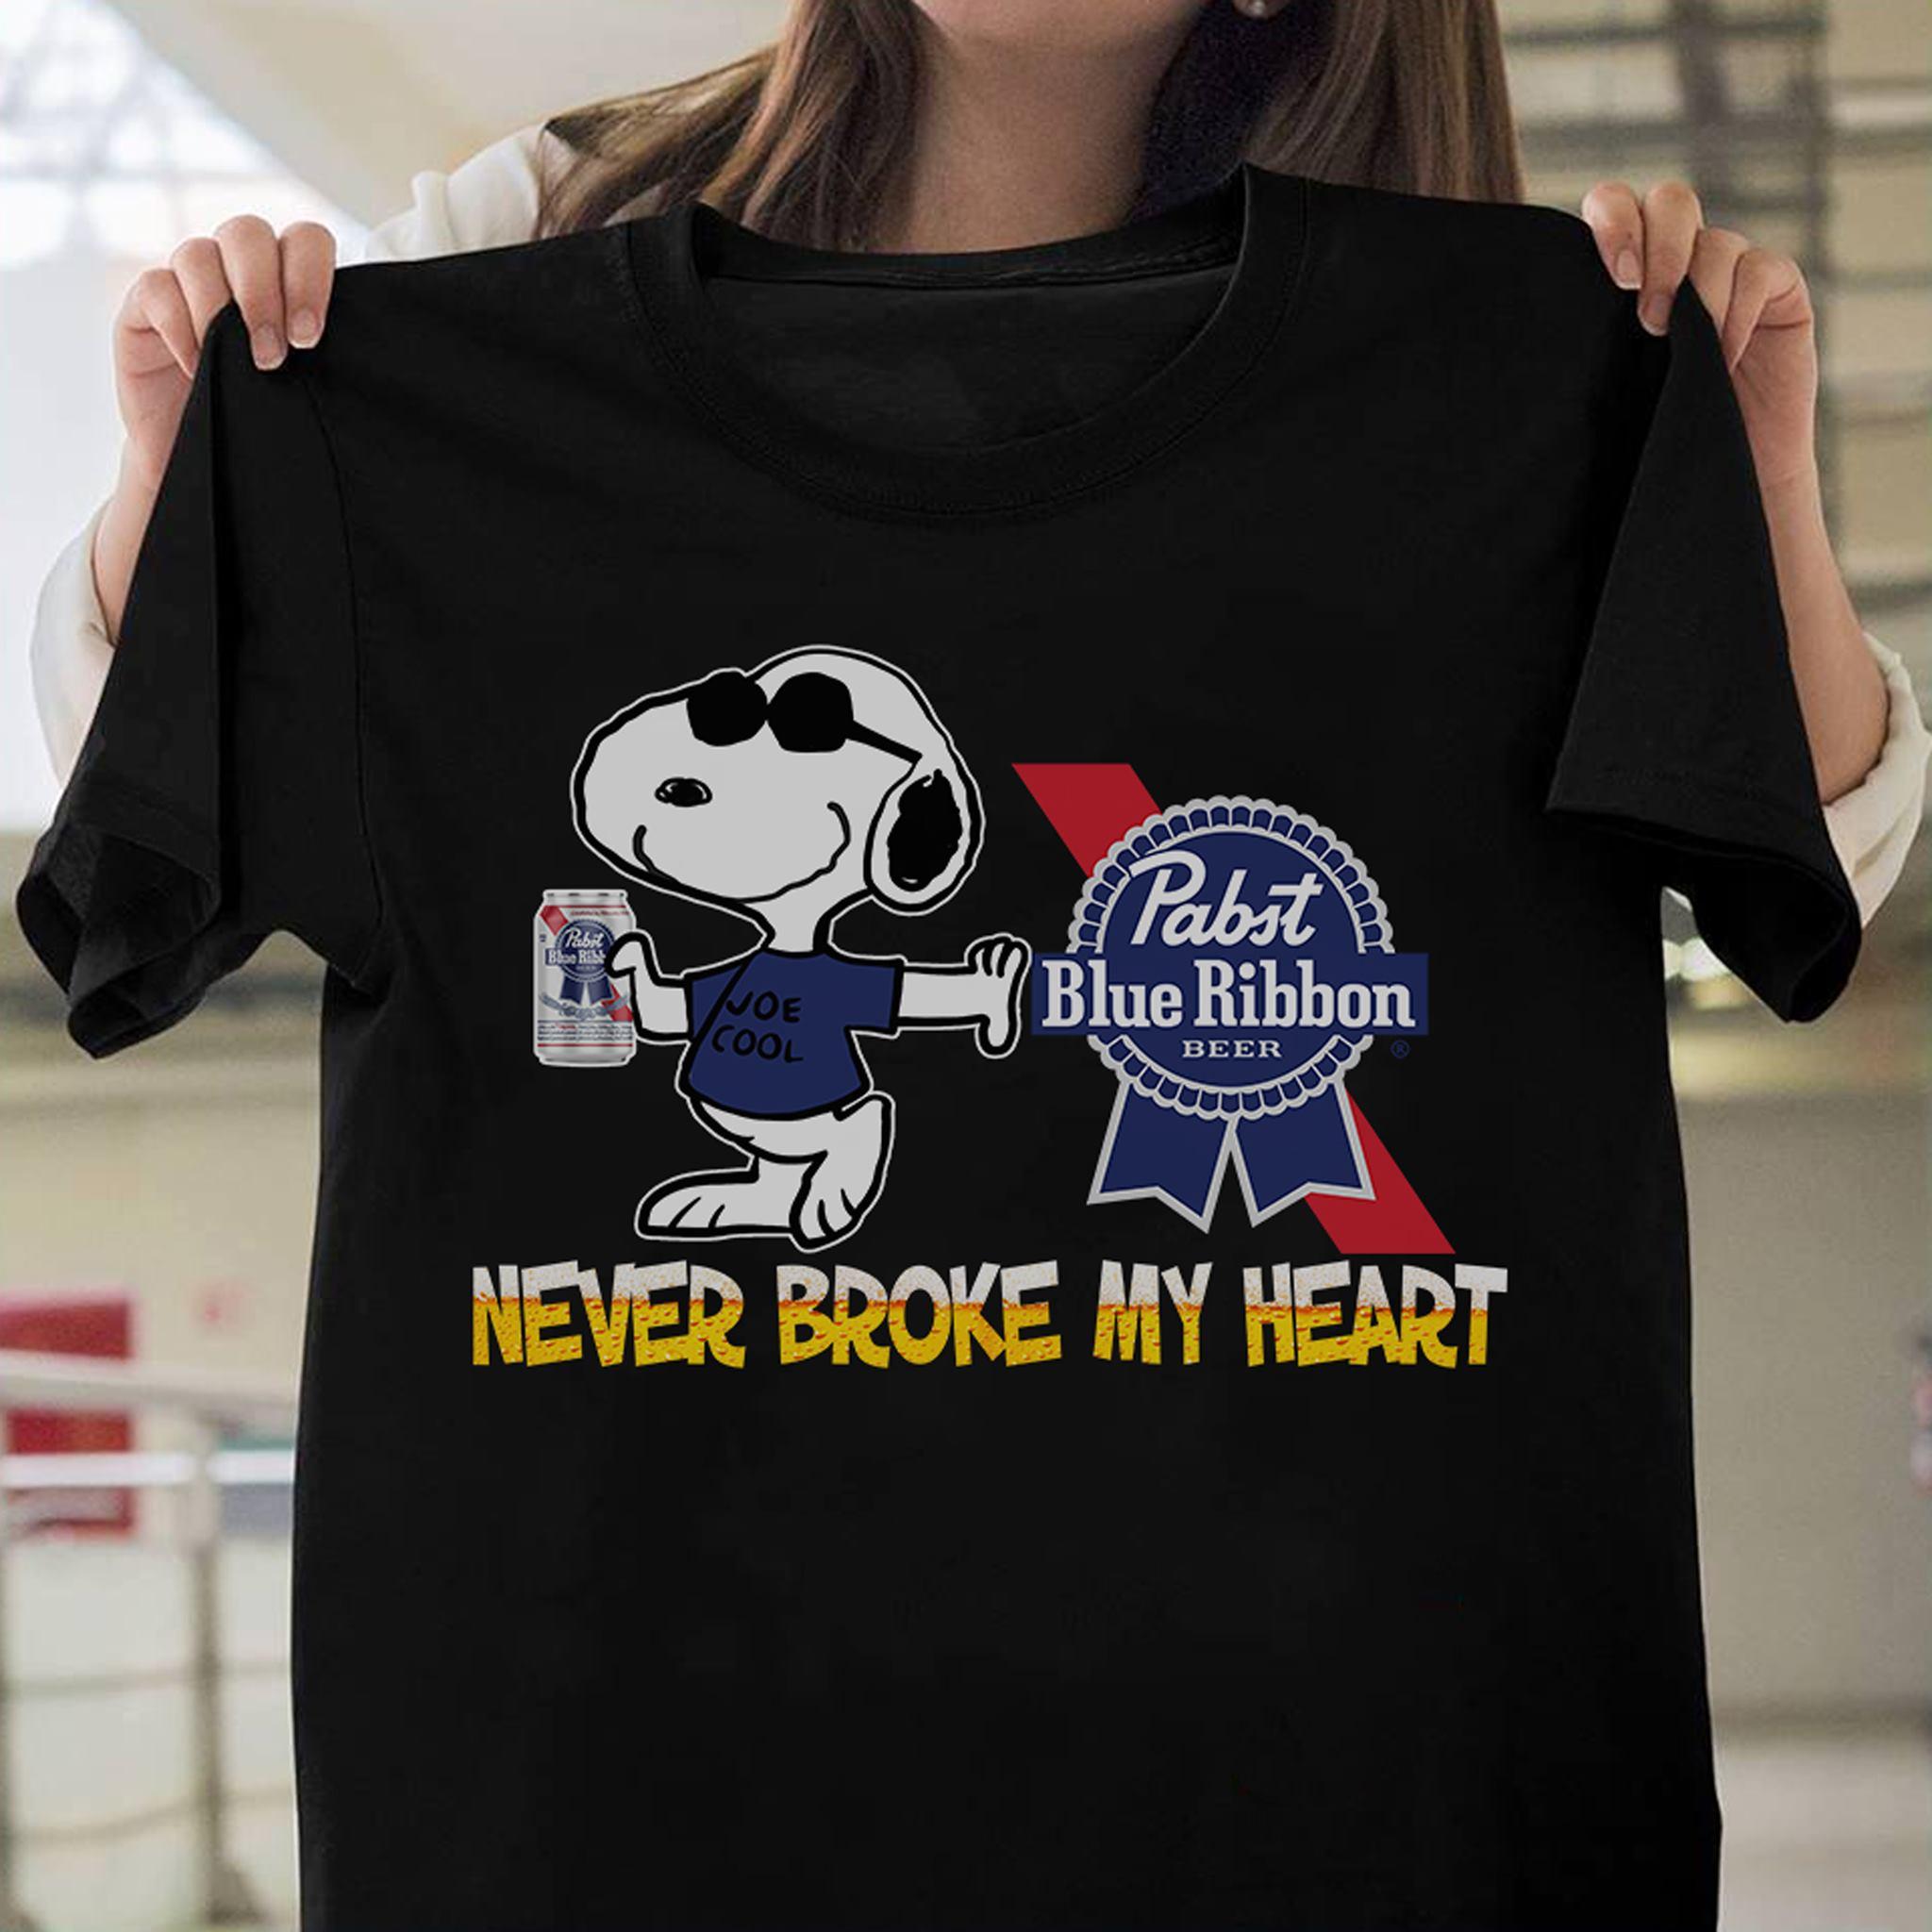 never broke my heart